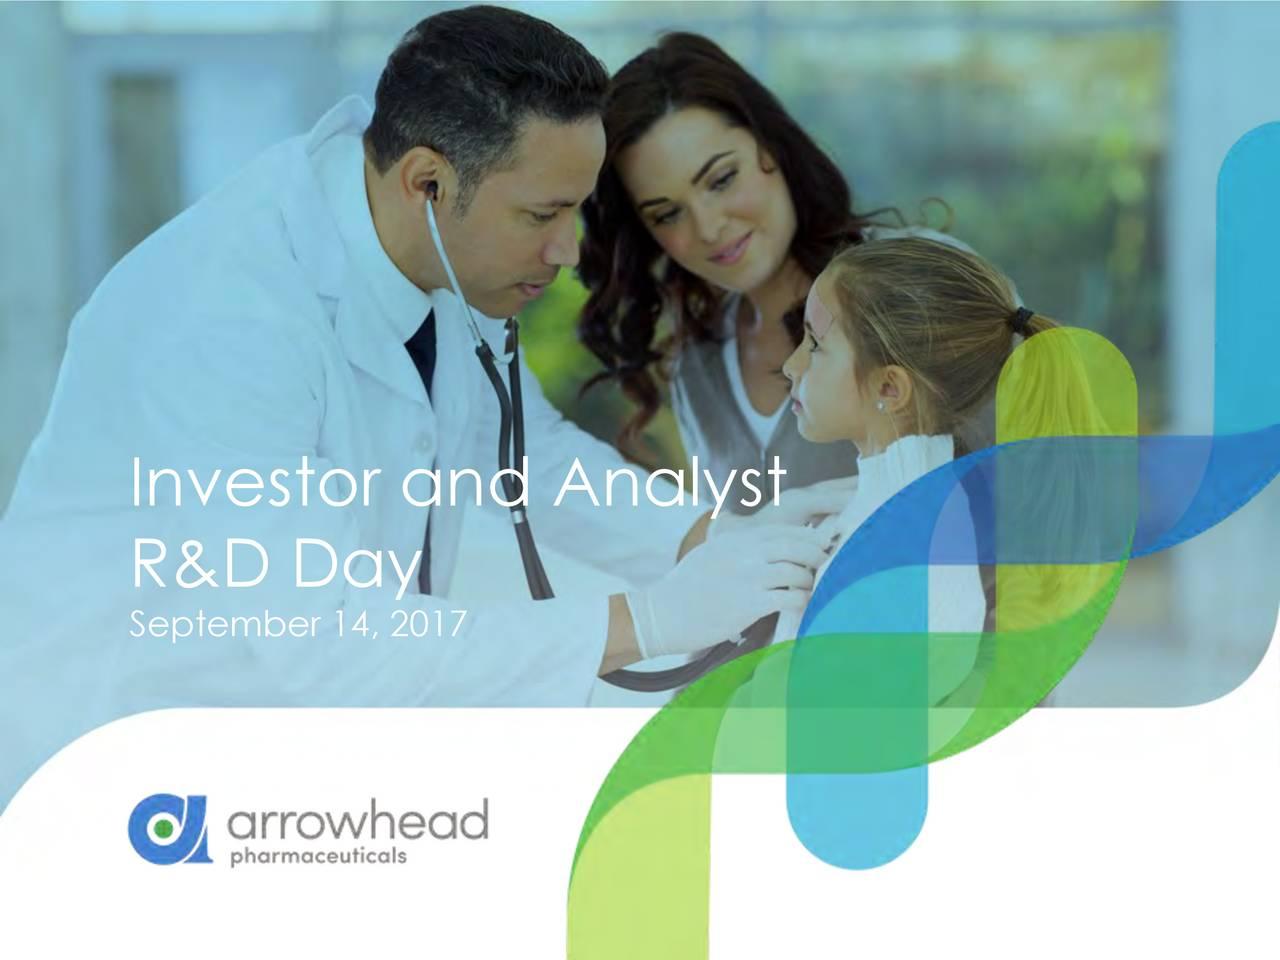 Investor and Analyst